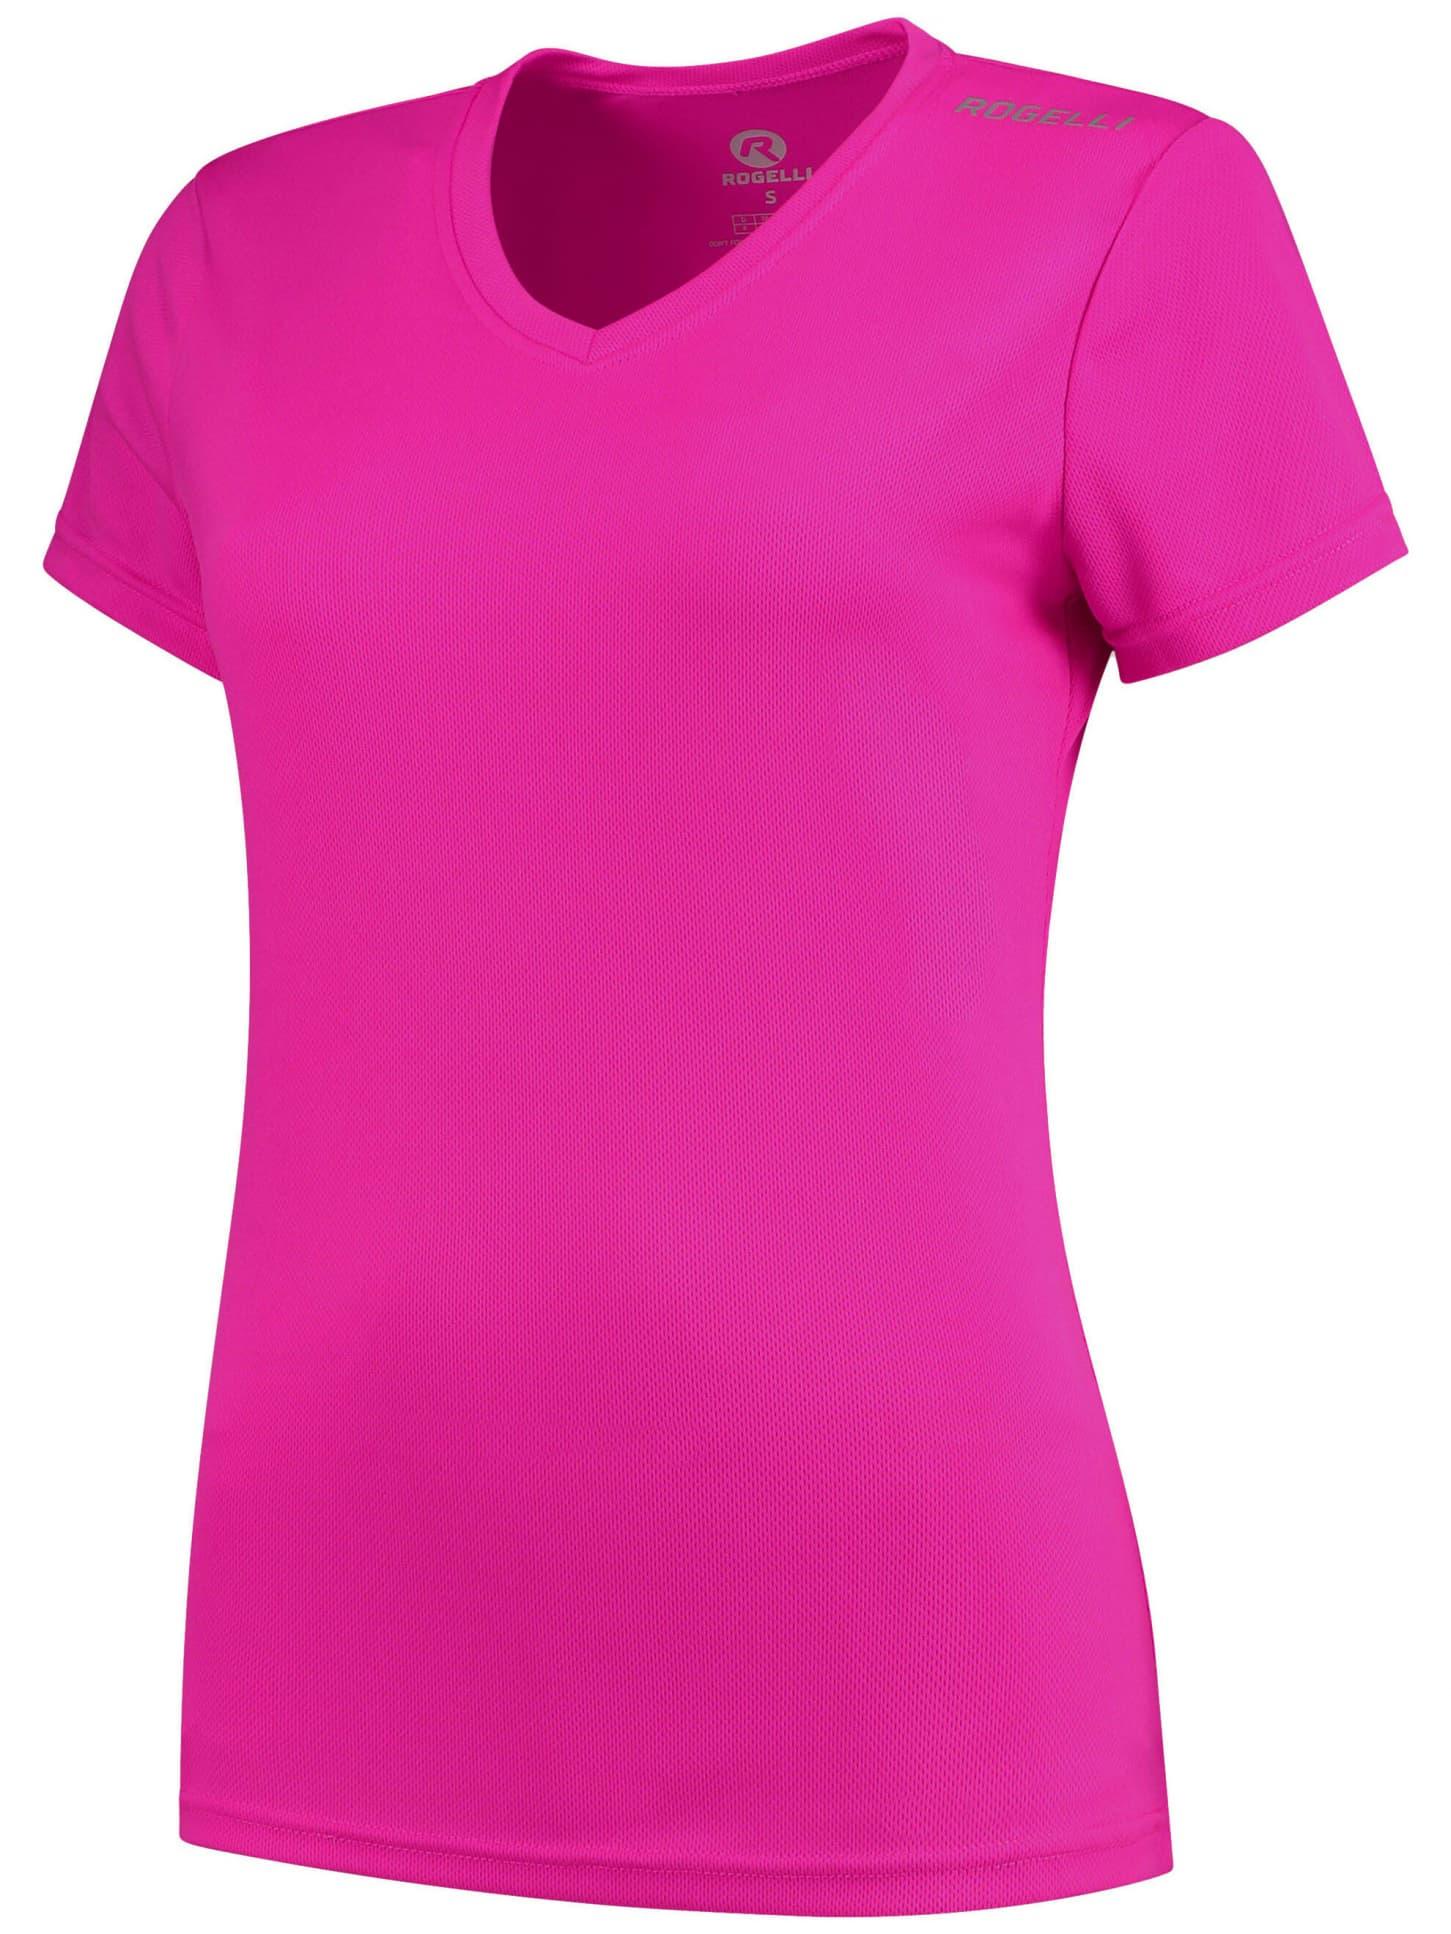 7e851a4f7 Dámske funkčné tričko Rogelli PROMOTION Lady, reflexné ružové ...